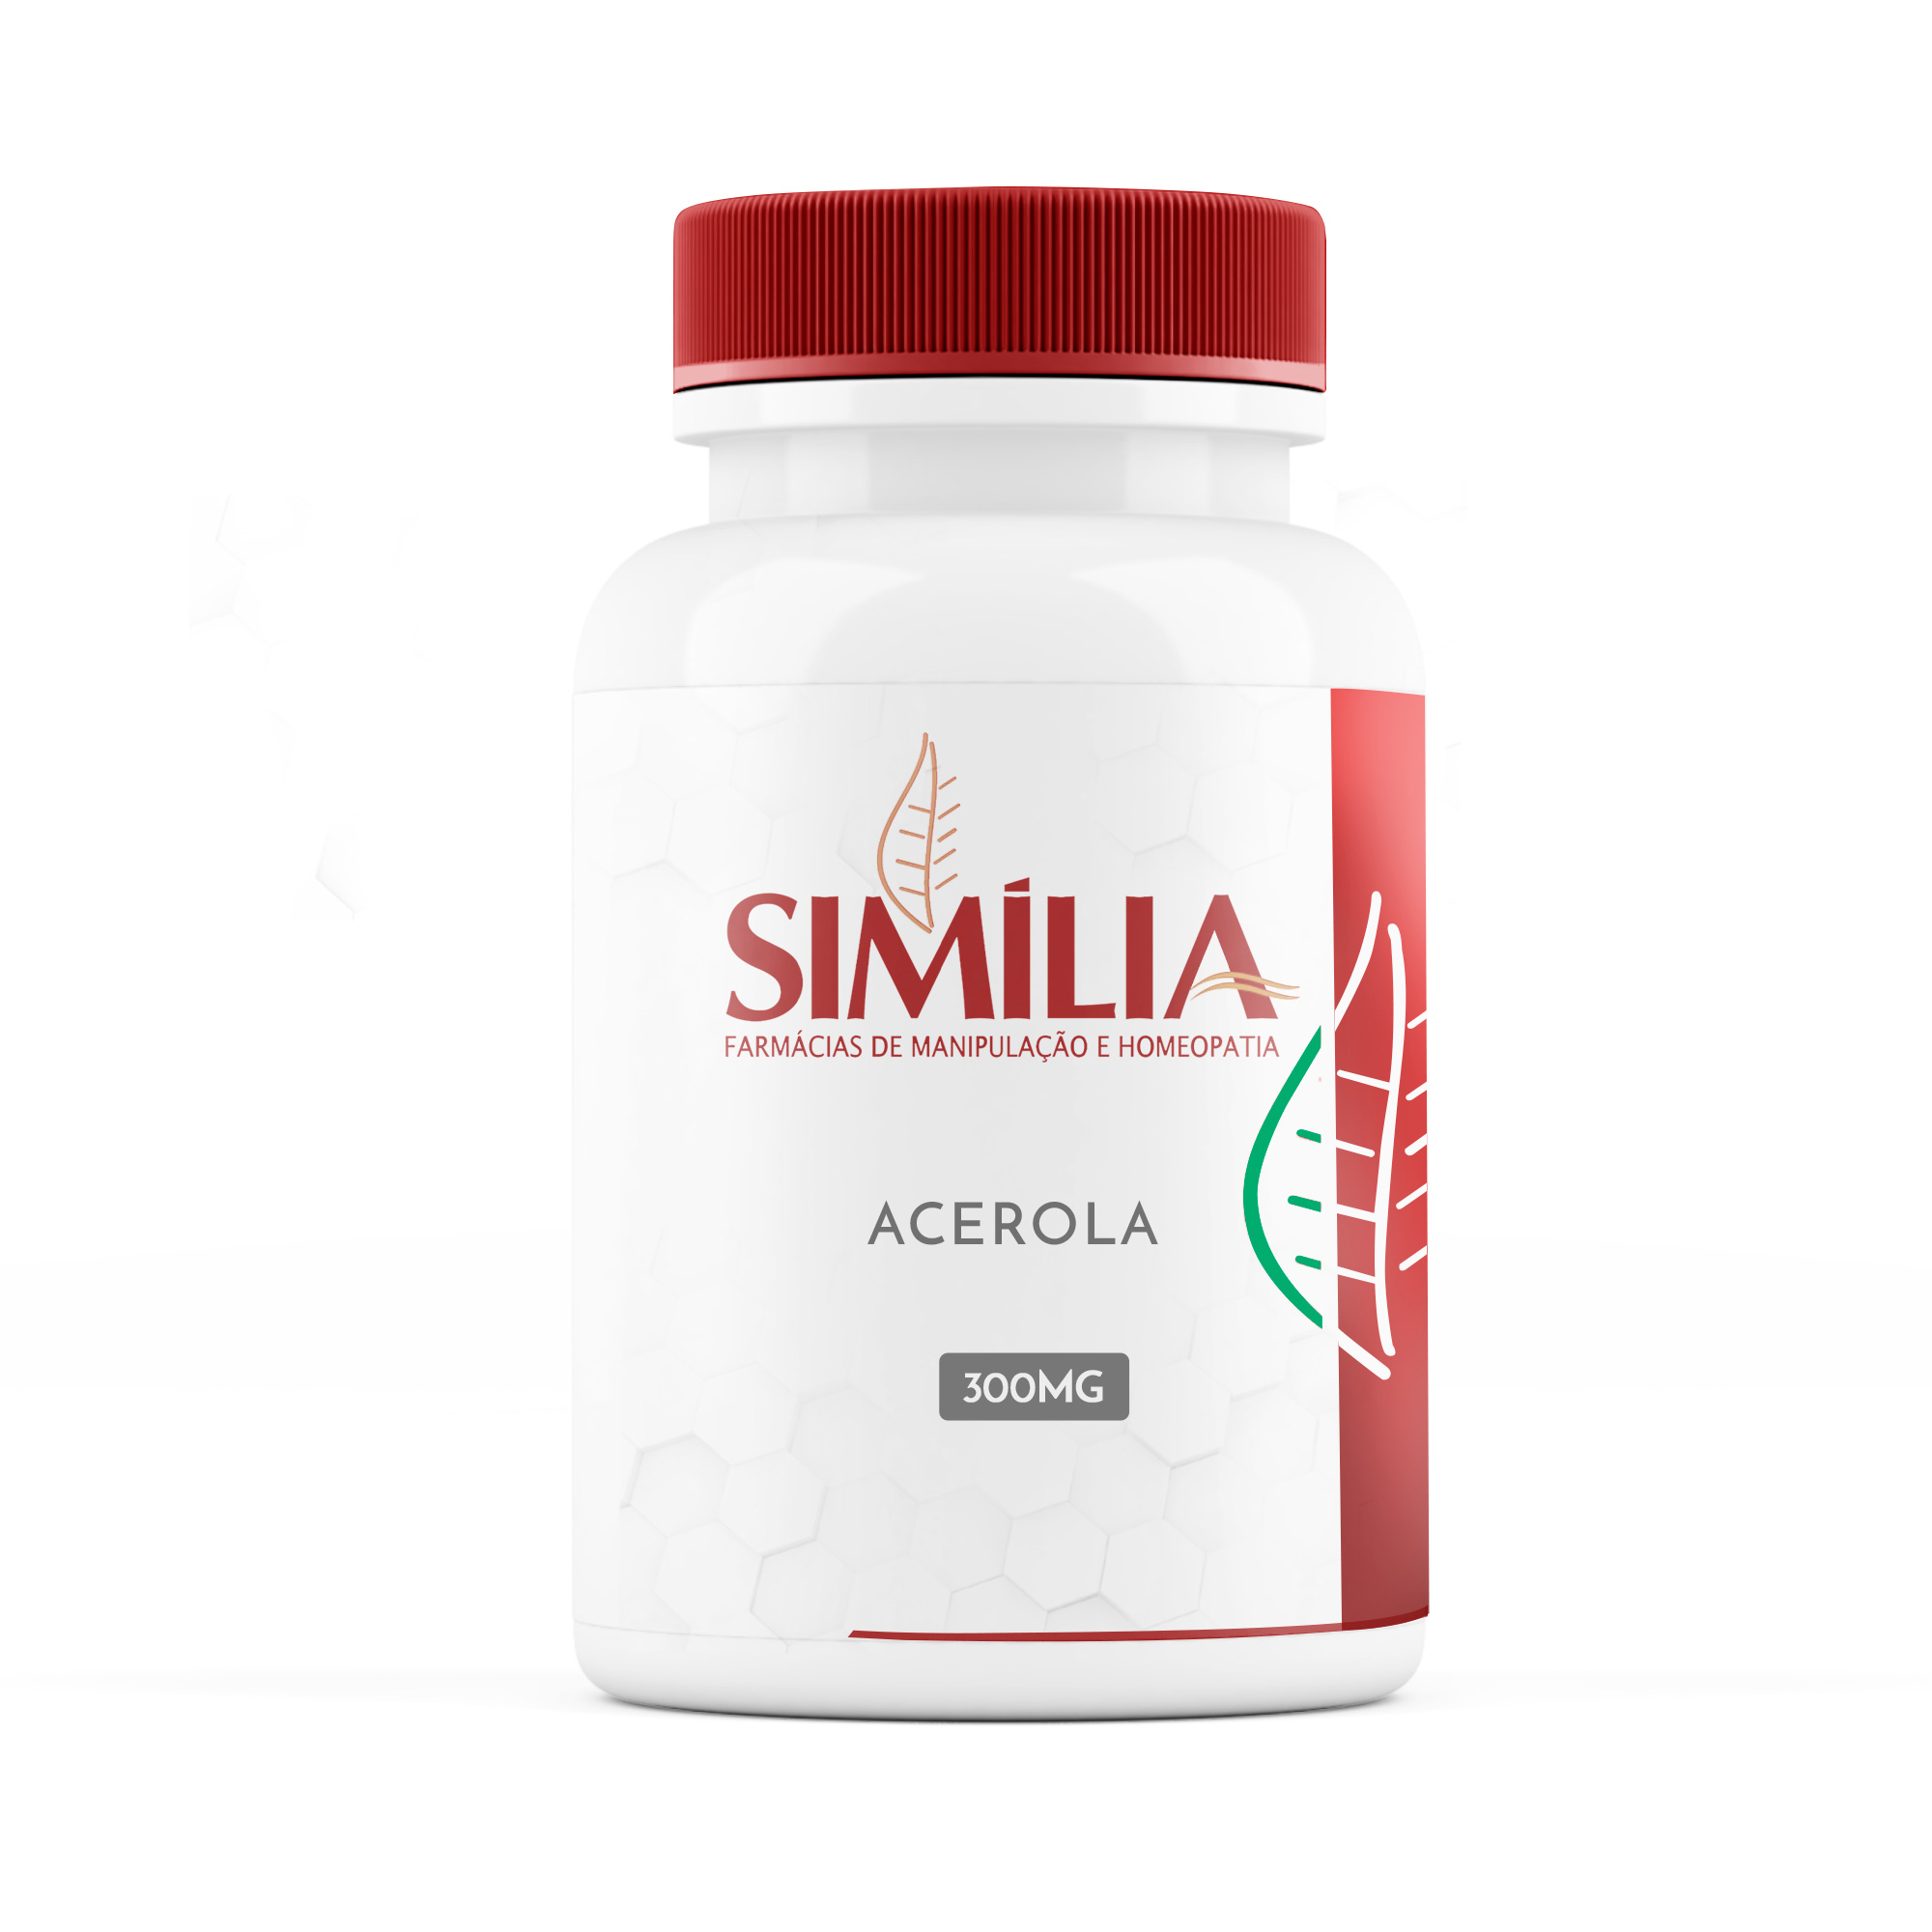 Acerola 300mg - Extrato Seco Padronizado - 25% Ácido ascórbico